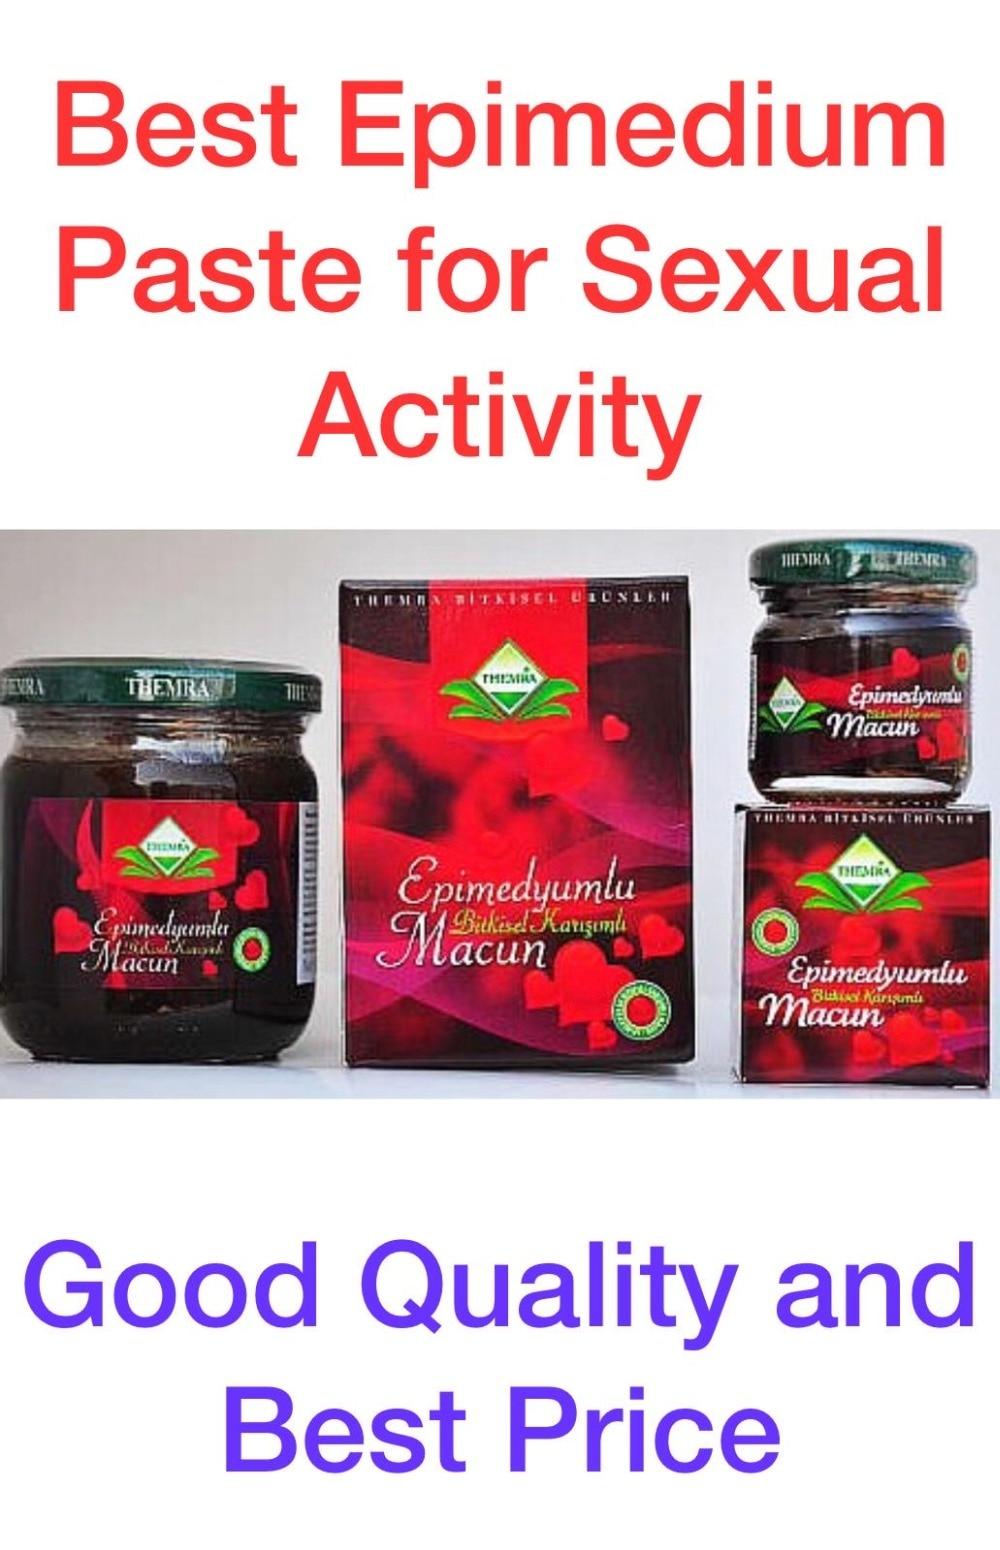 Türkish Horny Goat Epimedium Gingseng Men Afrodisiak Themra Organics Viagra